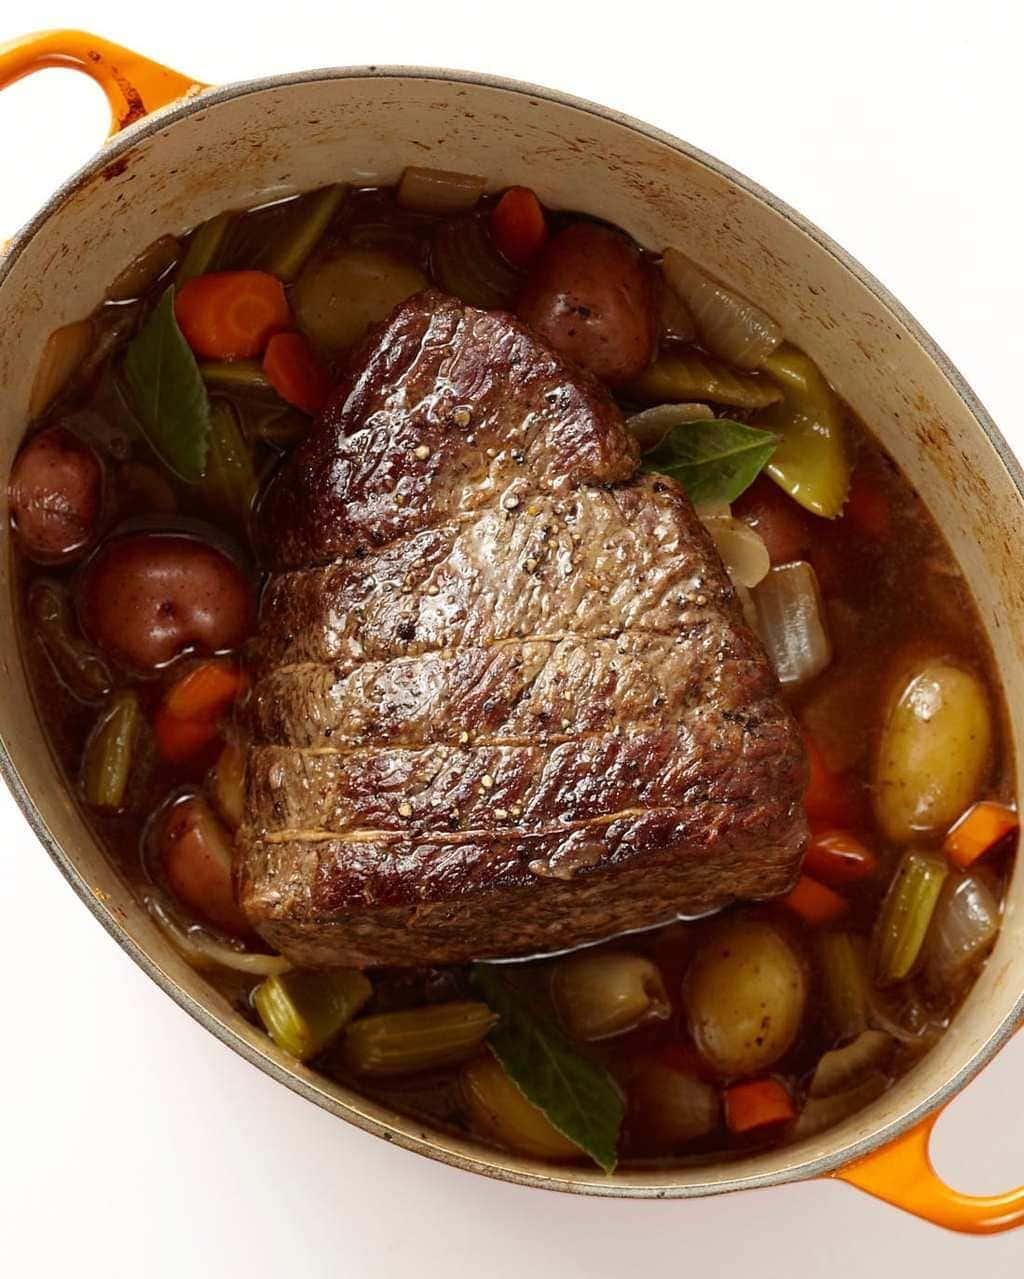 The Best Classic Pot Roast With Vegetables Oven Roast Tara Teaspoon